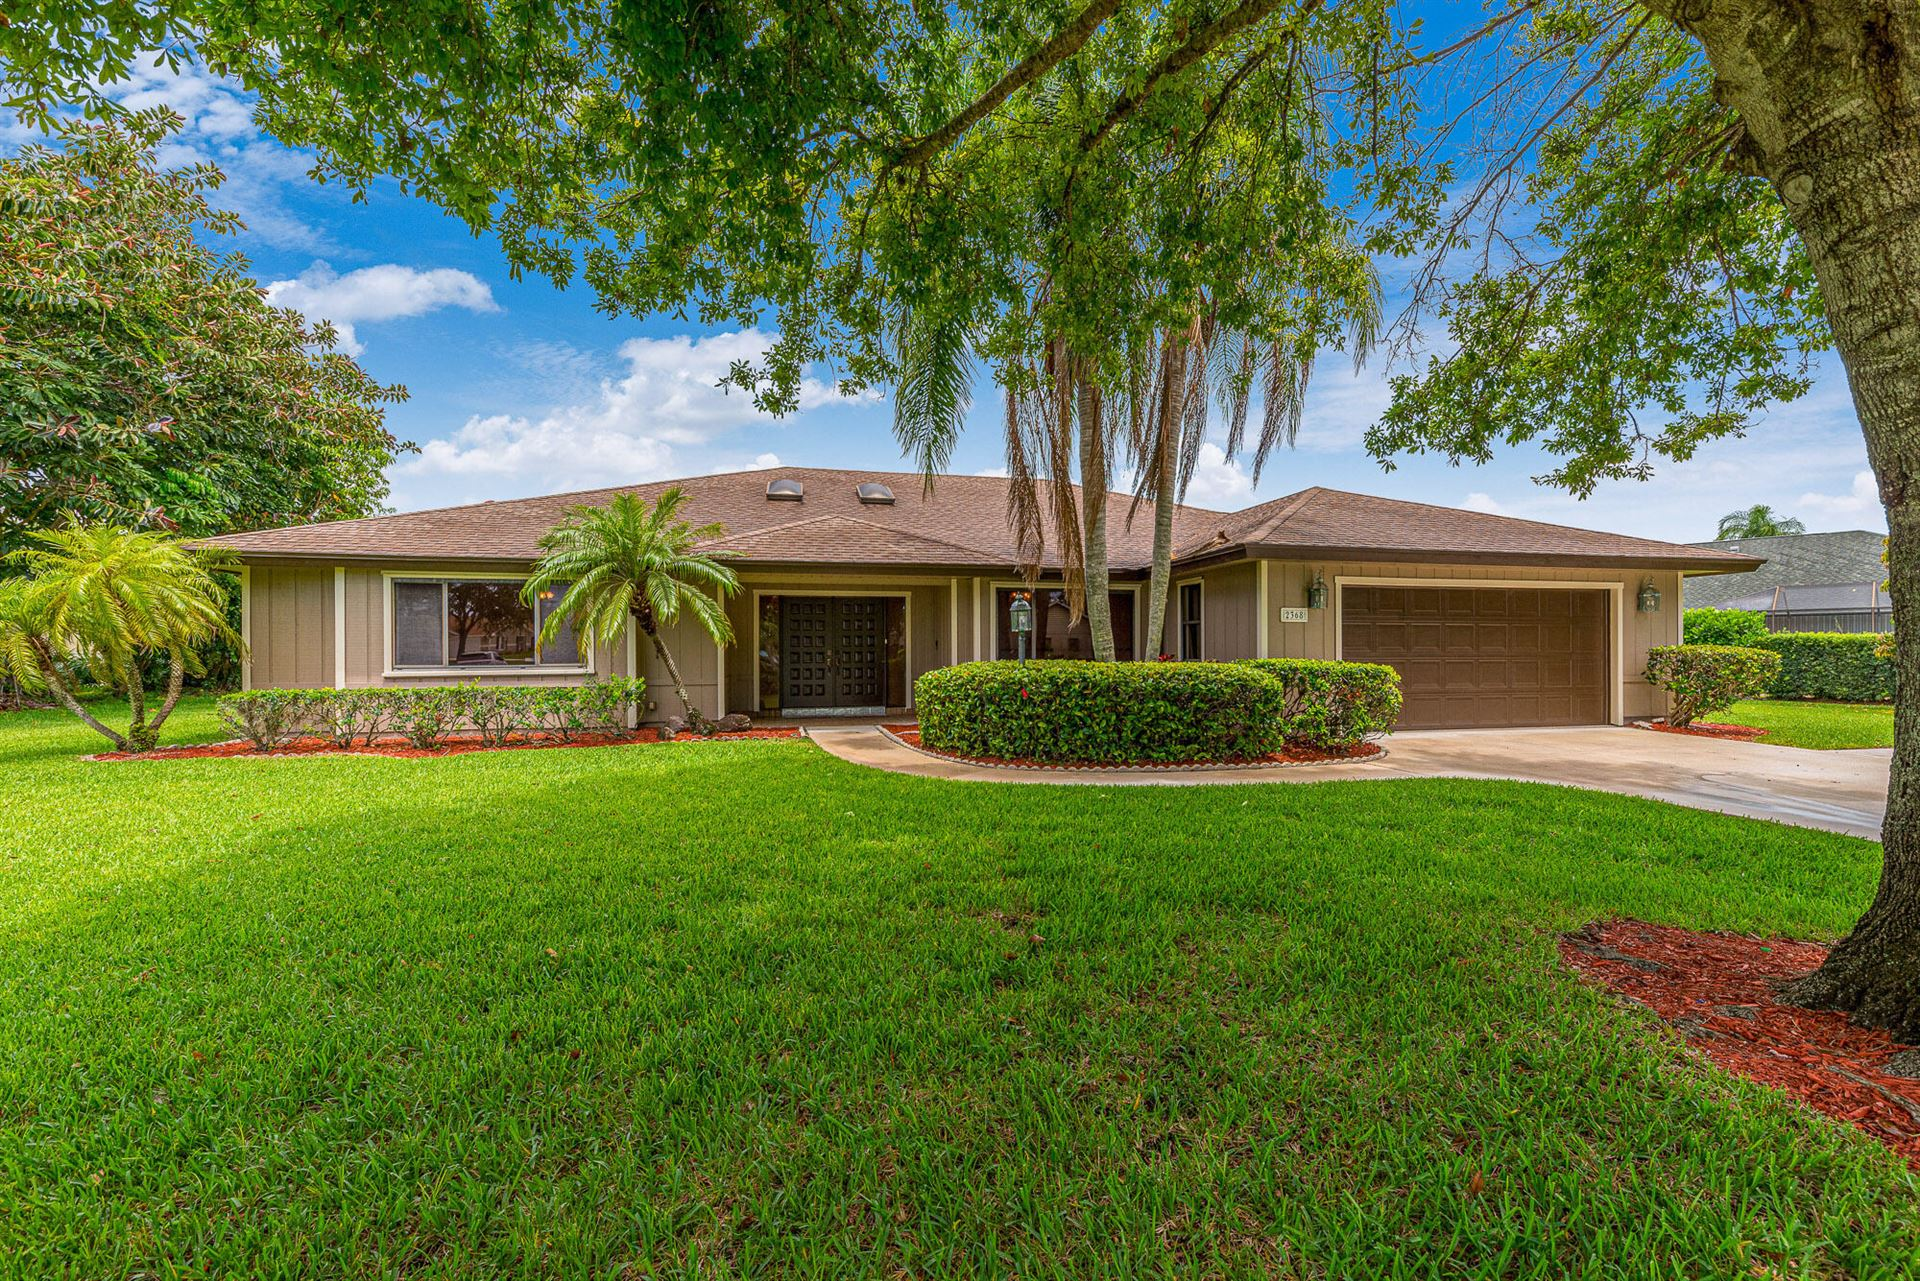 2368 NE Ginger Terrace, Jensen Beach, FL 34957 - MLS#: RX-10750248